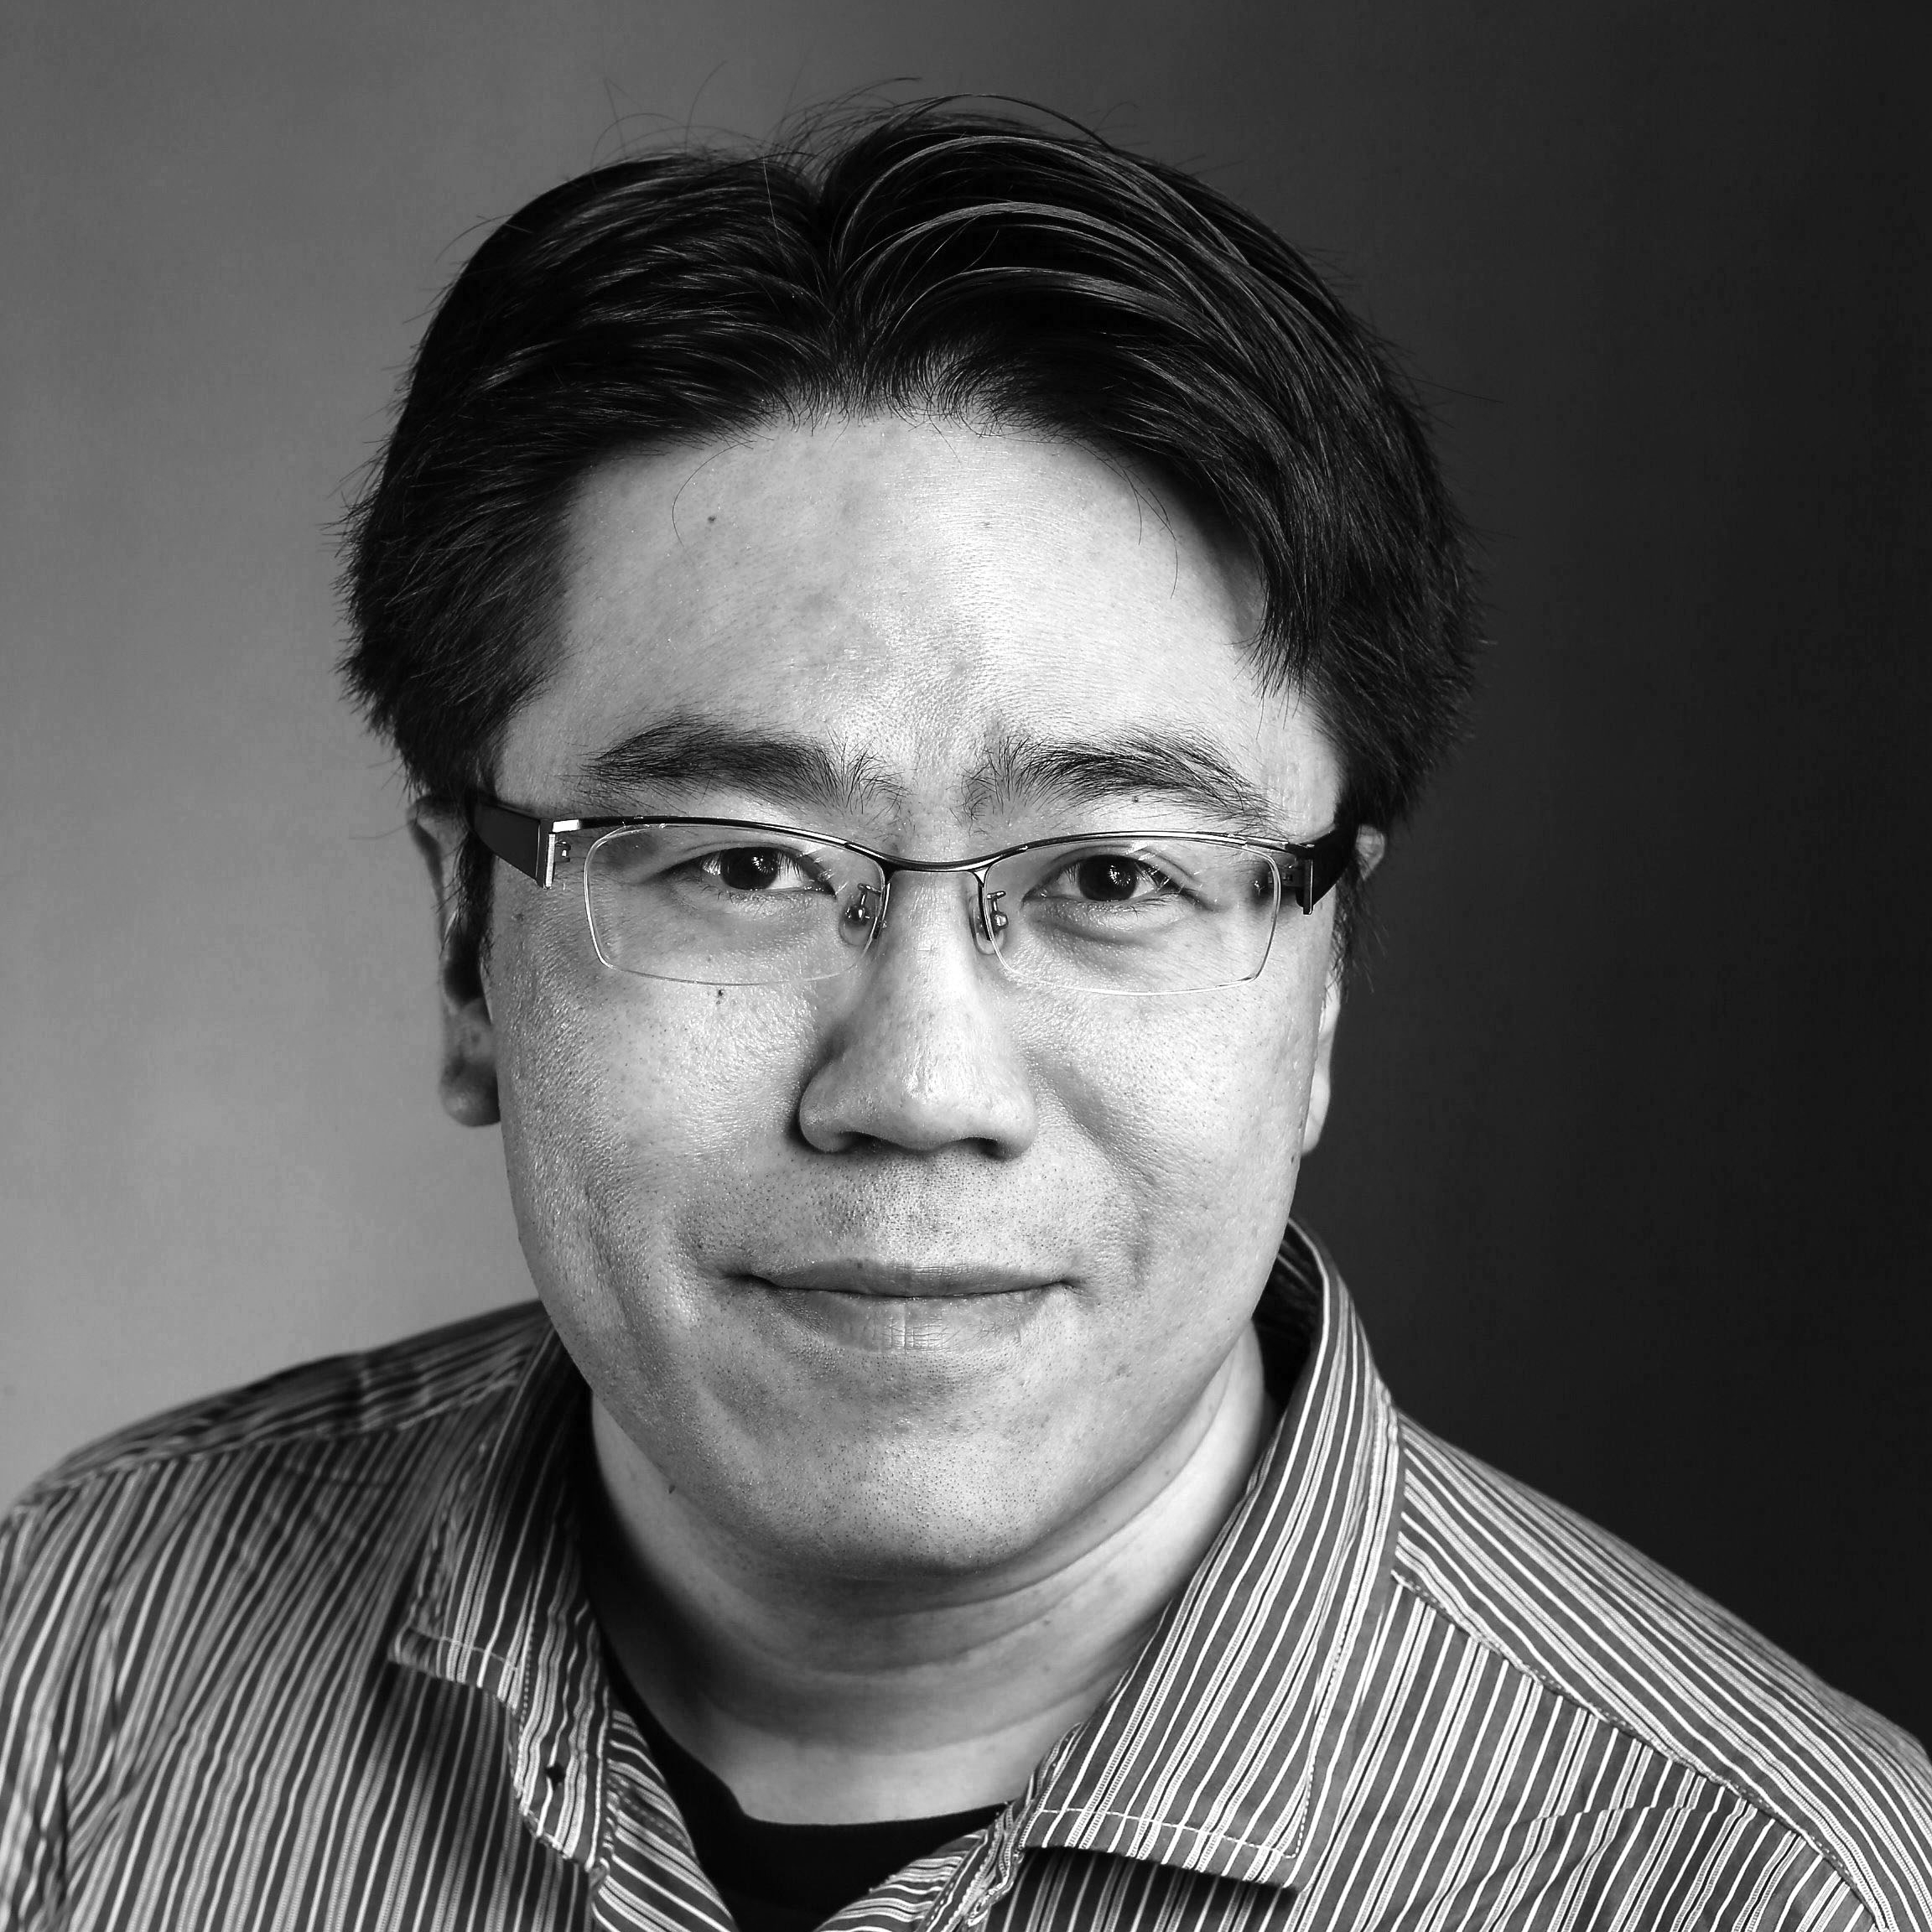 Wilson Lau - Principal Software Architect, Orange Silicon Valley